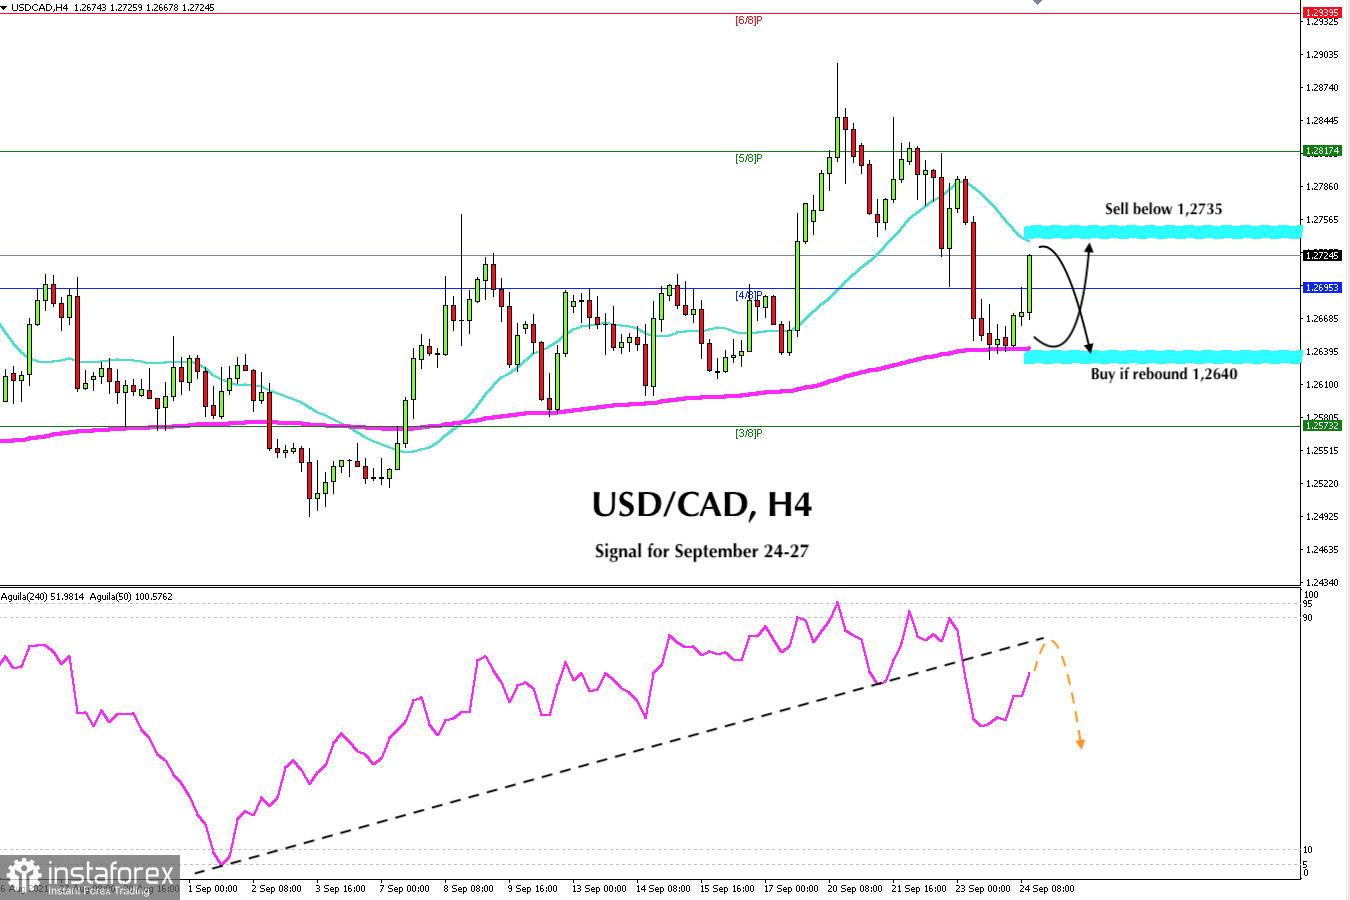 Trading Signal for USD/CAD for September 24 - 27, 2021: Range 1.2740(SMA 21) - 12640(EMA 200)